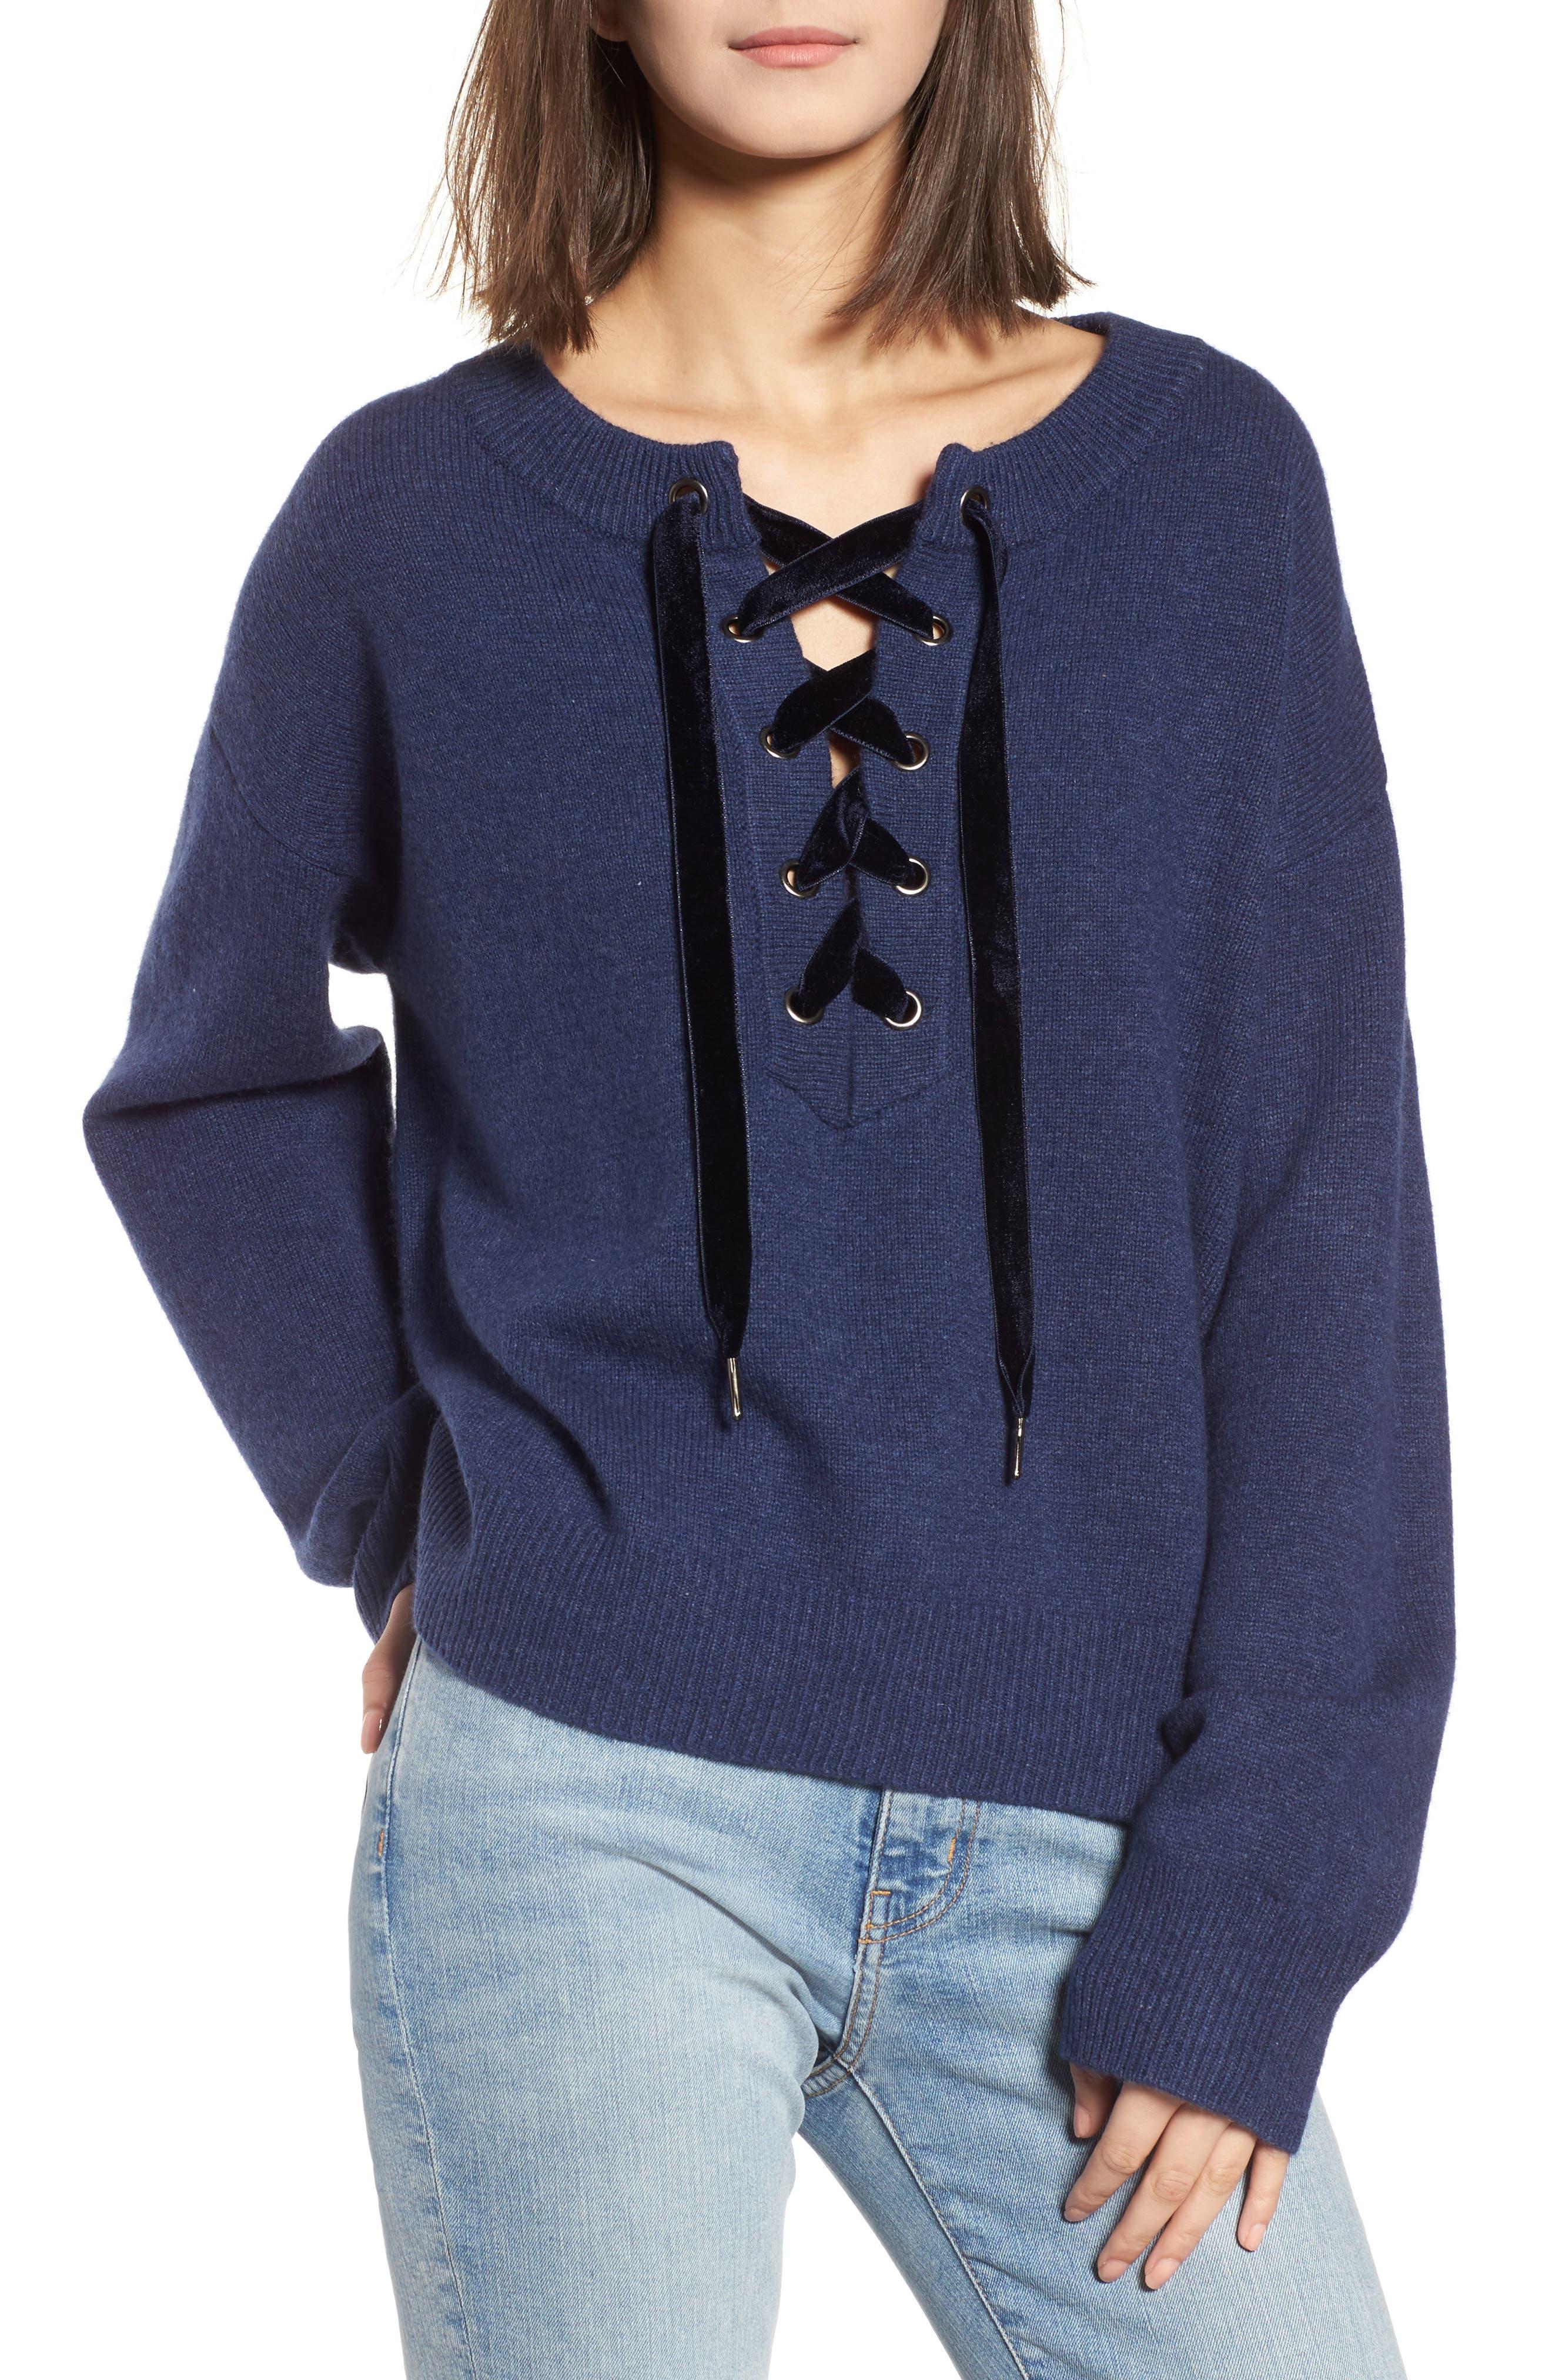 Alternate Image 1 Selected - Rails Olivia Lace-Up Sweater